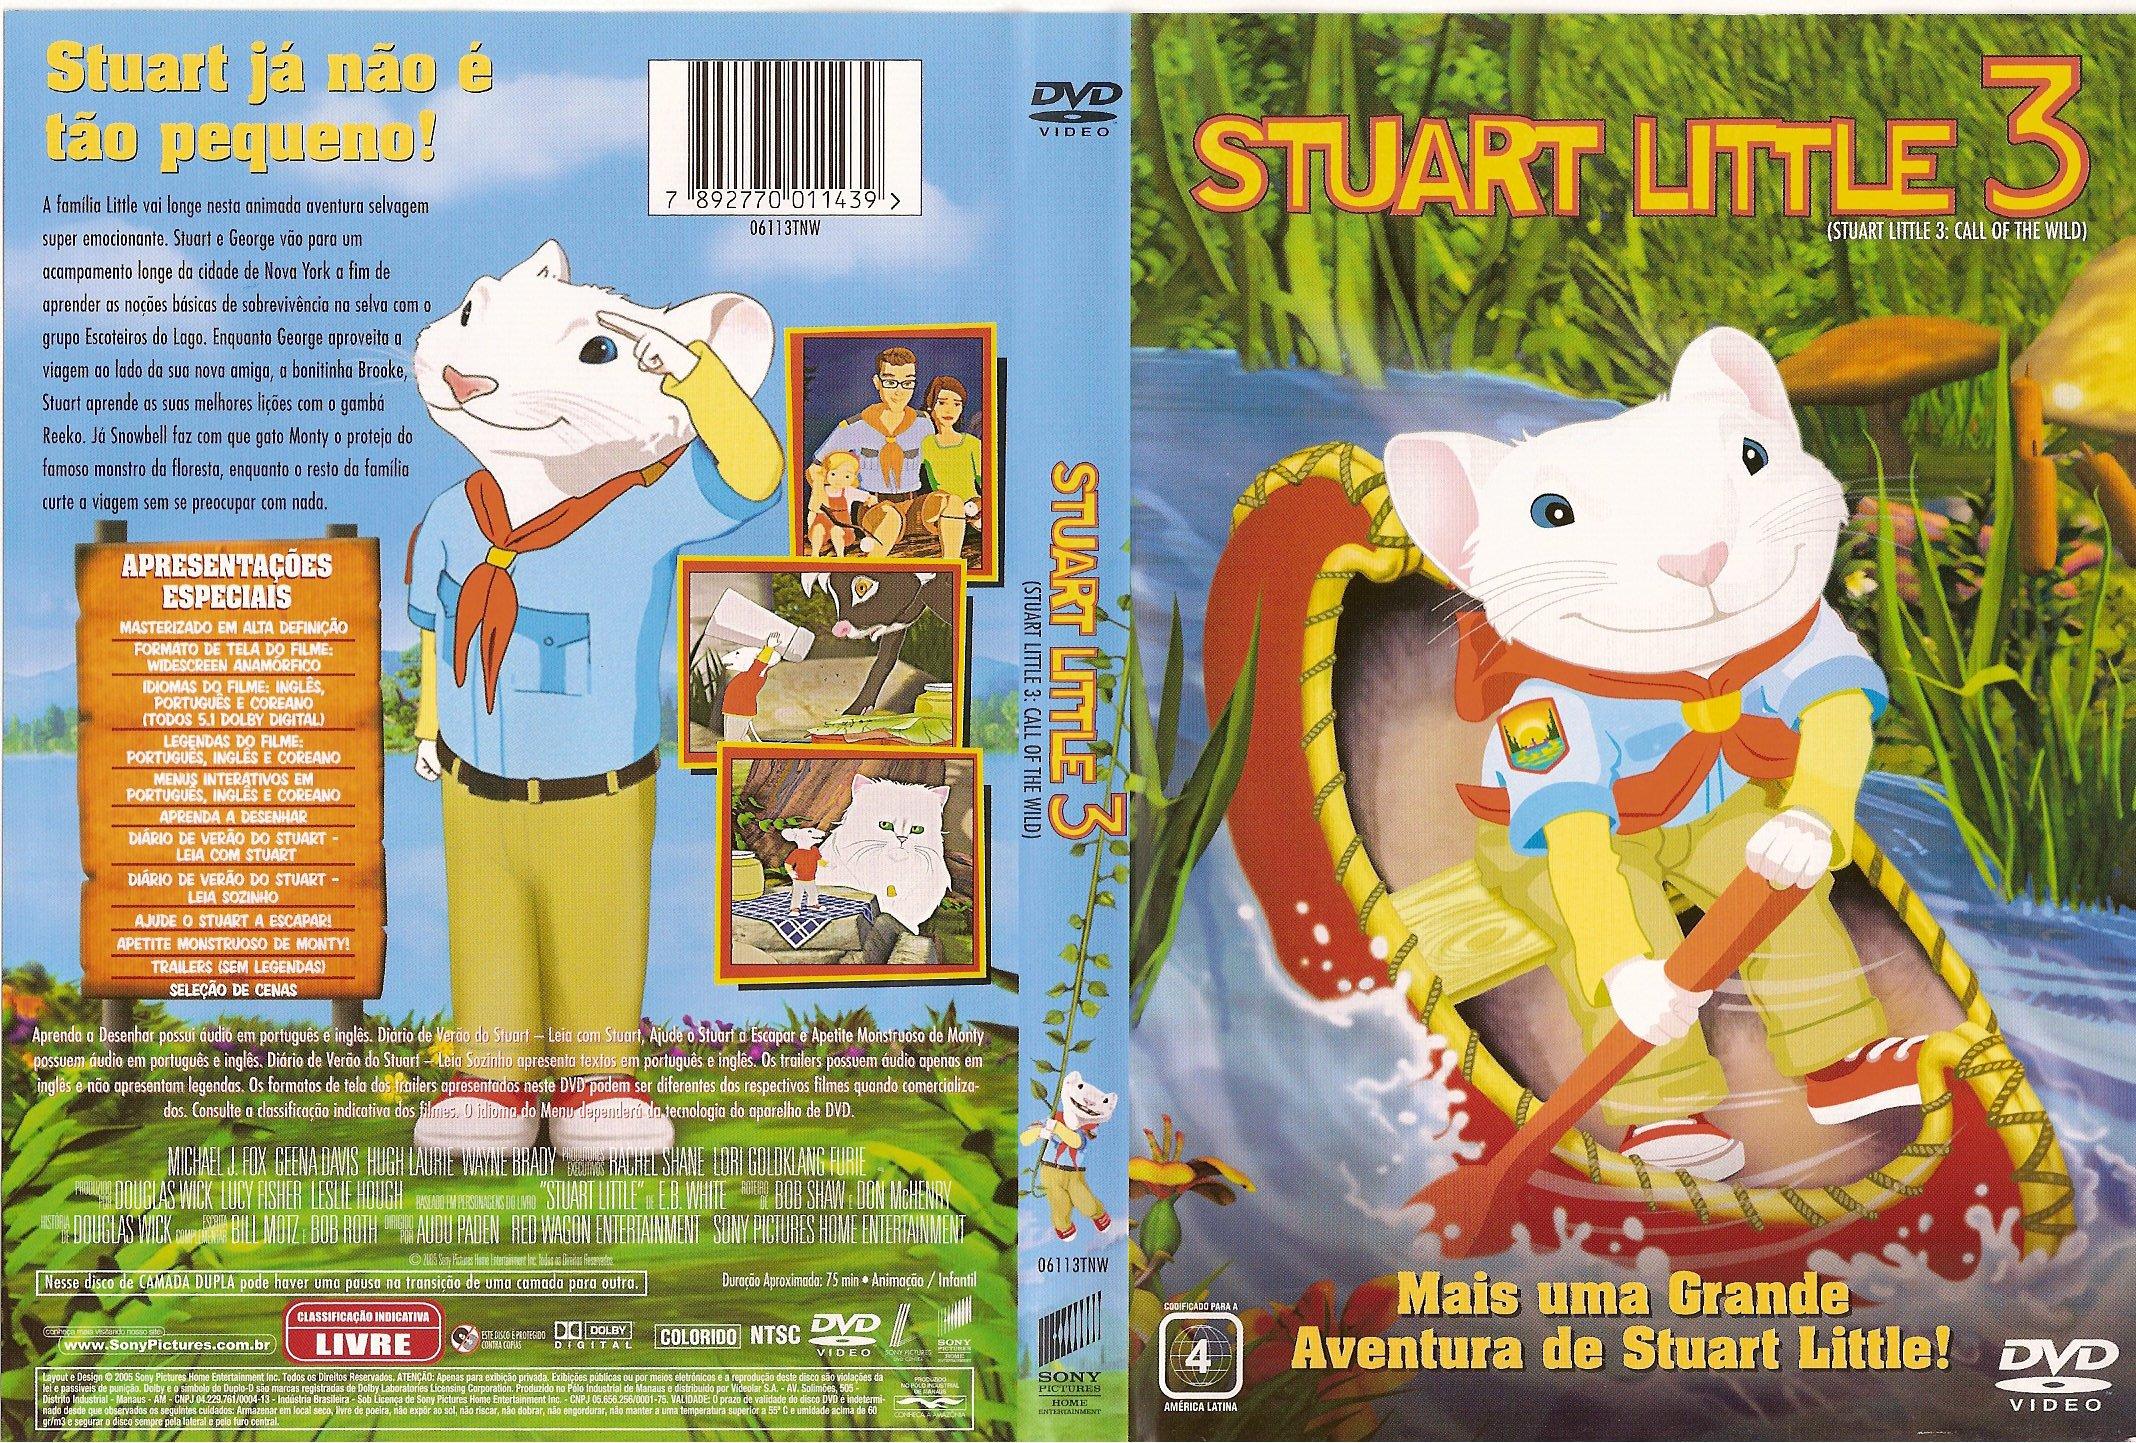 StuartLittle3